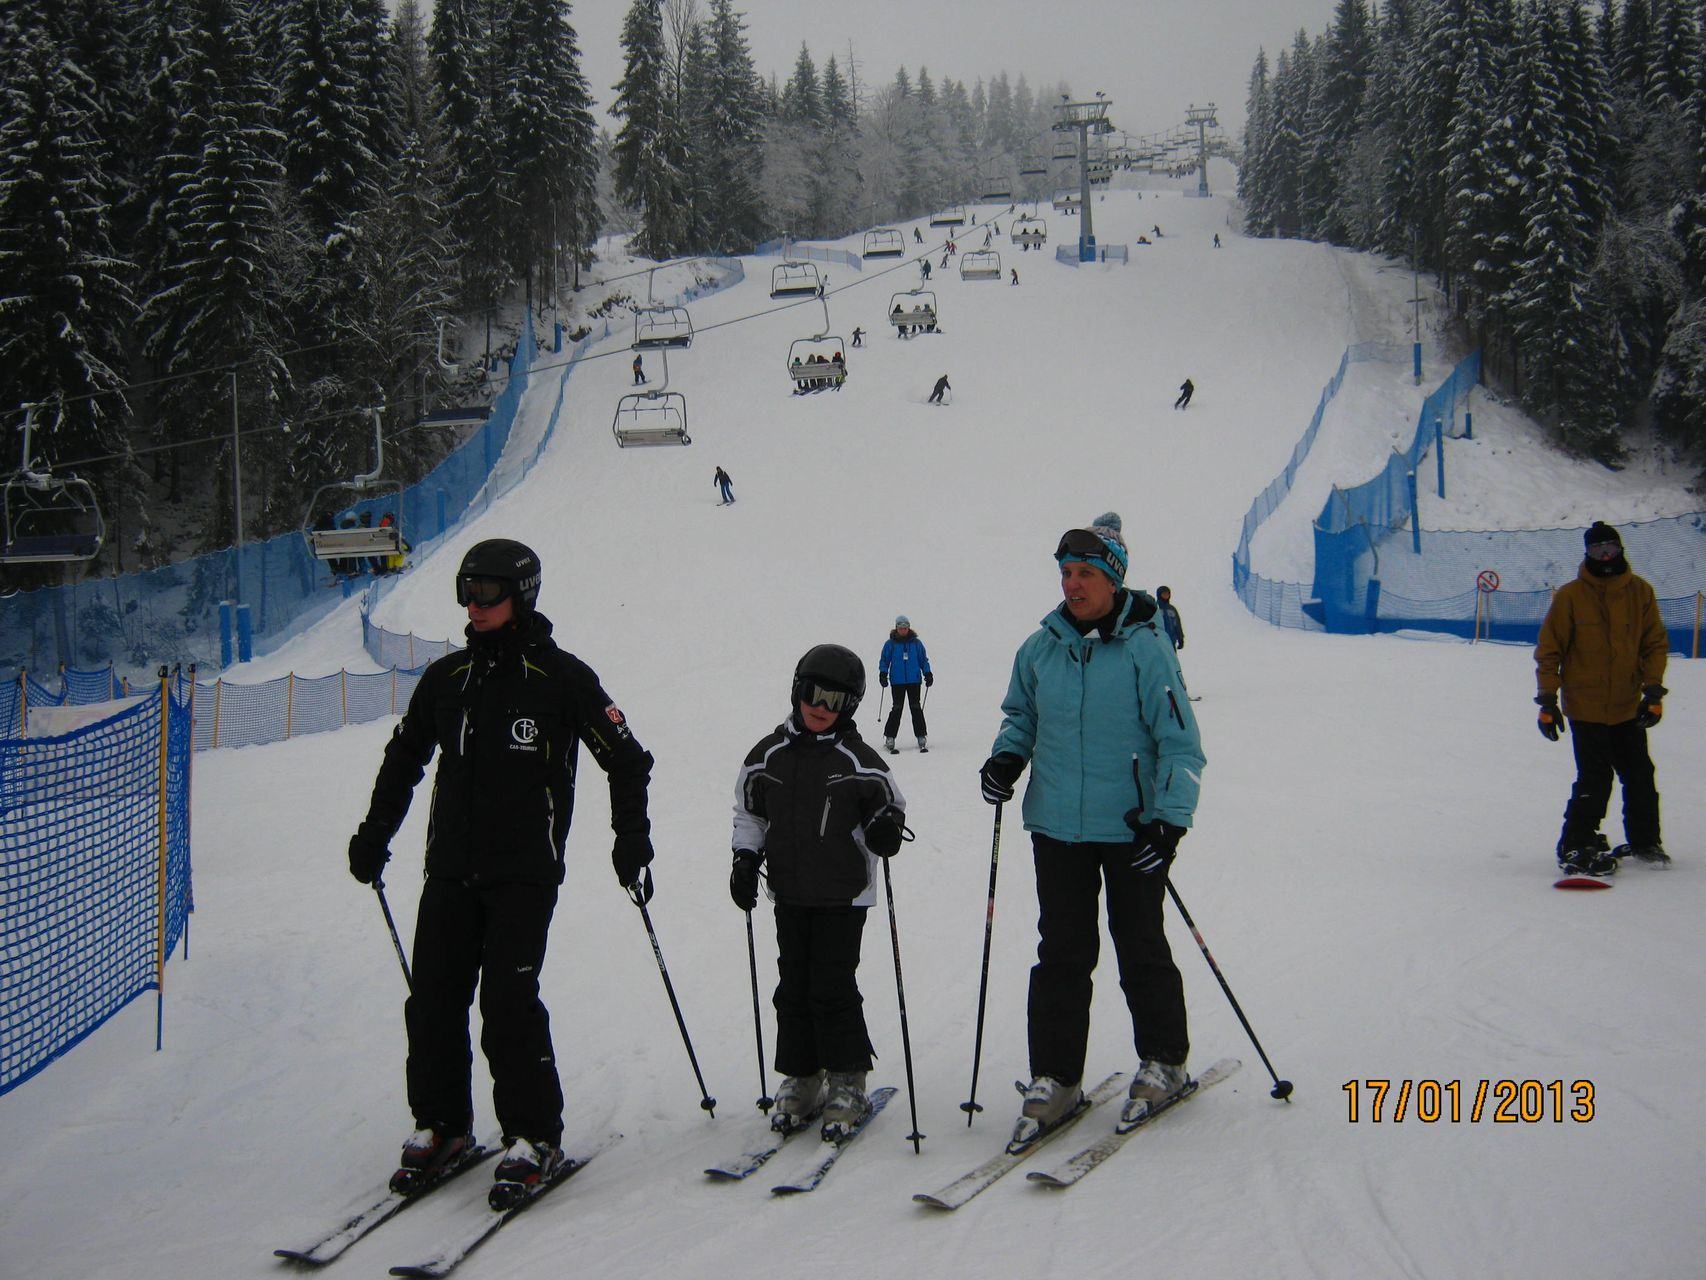 CarTourist_narty-snowboard_2013-foto-19